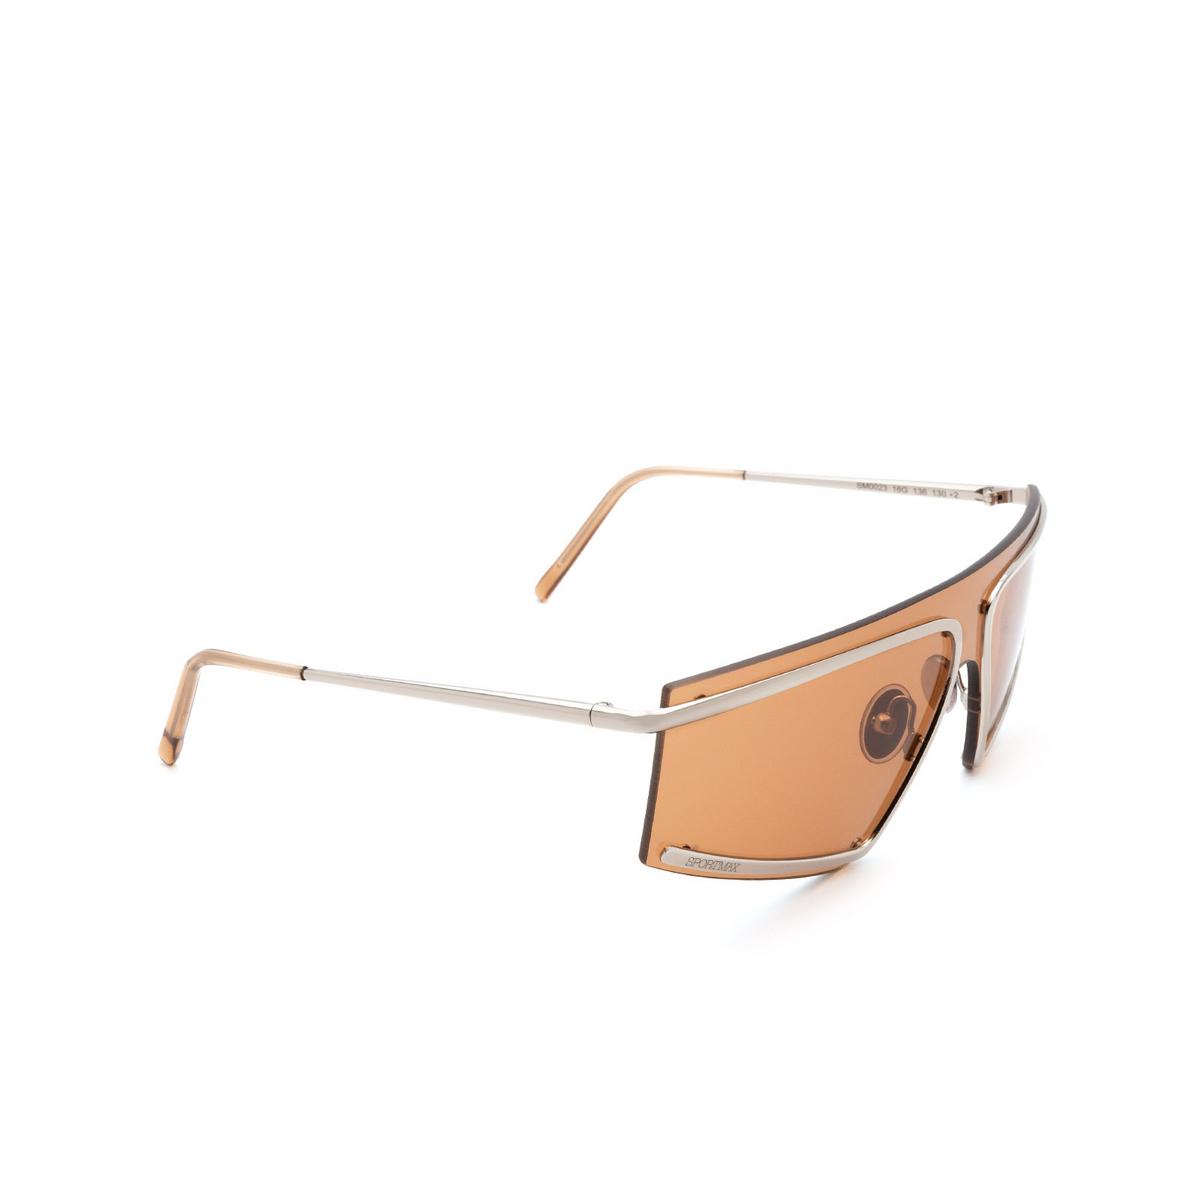 Sportmax® Mask Sunglasses: SM0023 color Shiny Palladium 16G - three-quarters view.